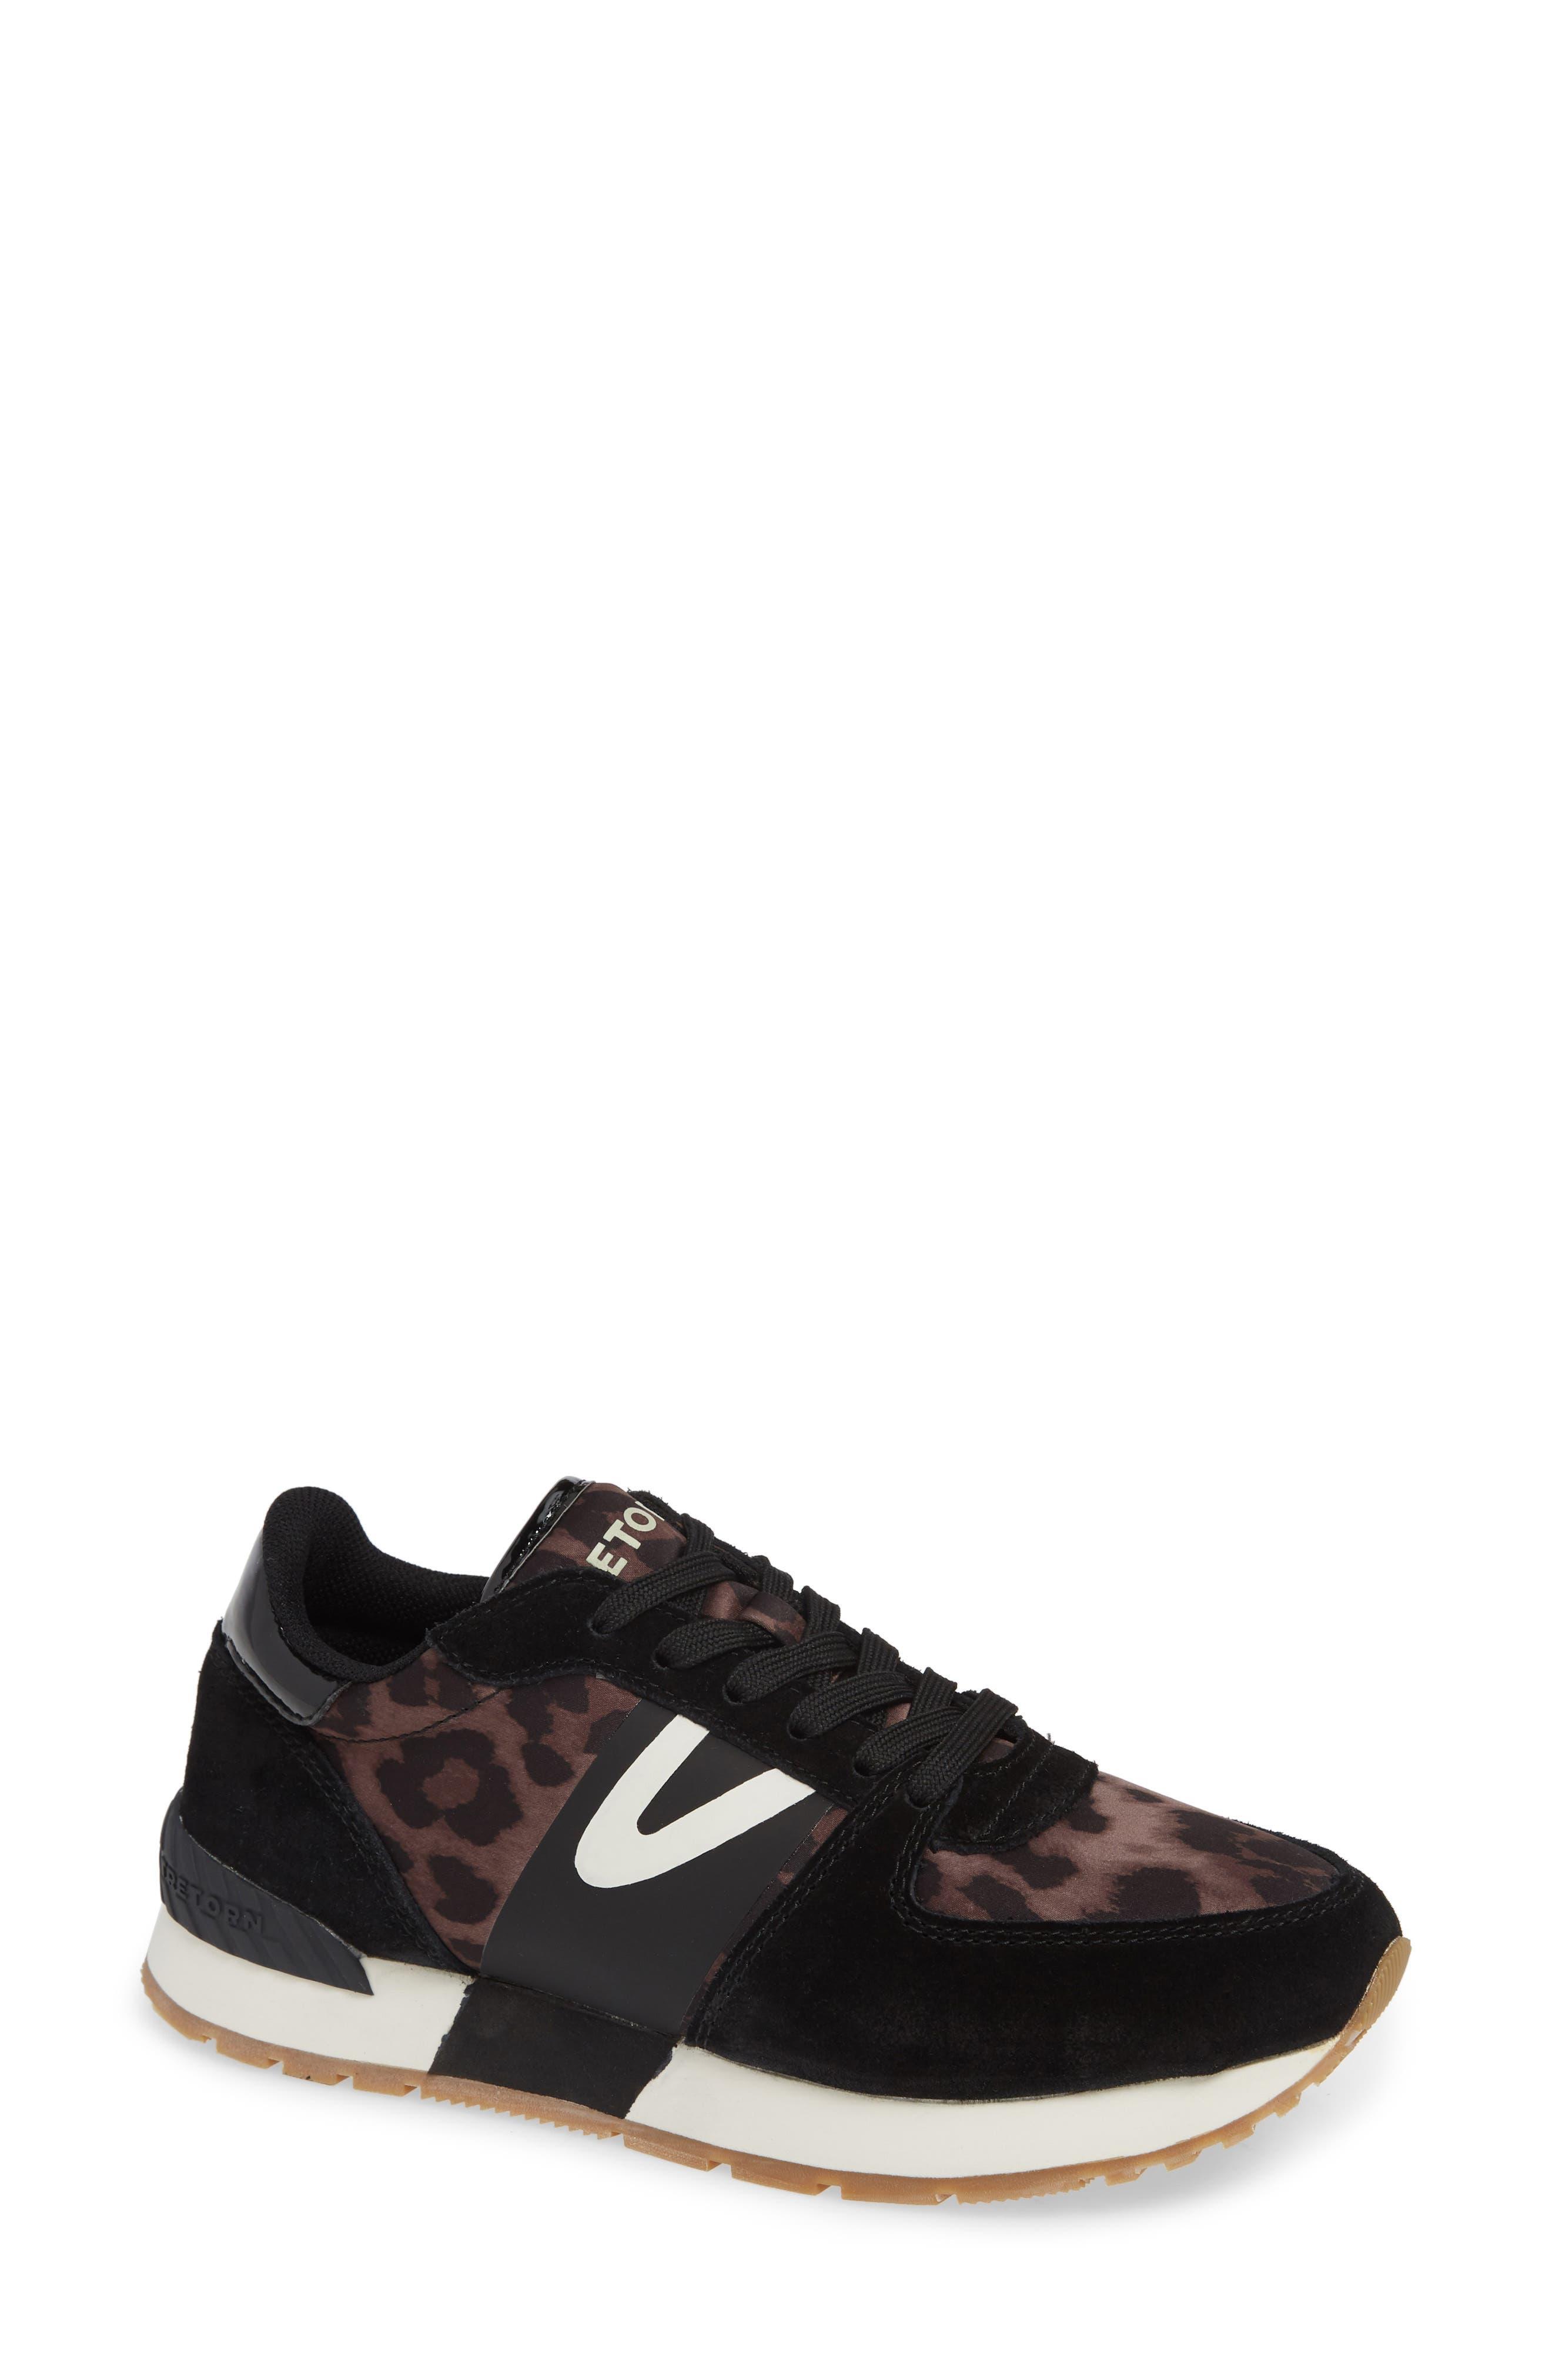 Loyola 9 Sneaker,                         Main,                         color, 002